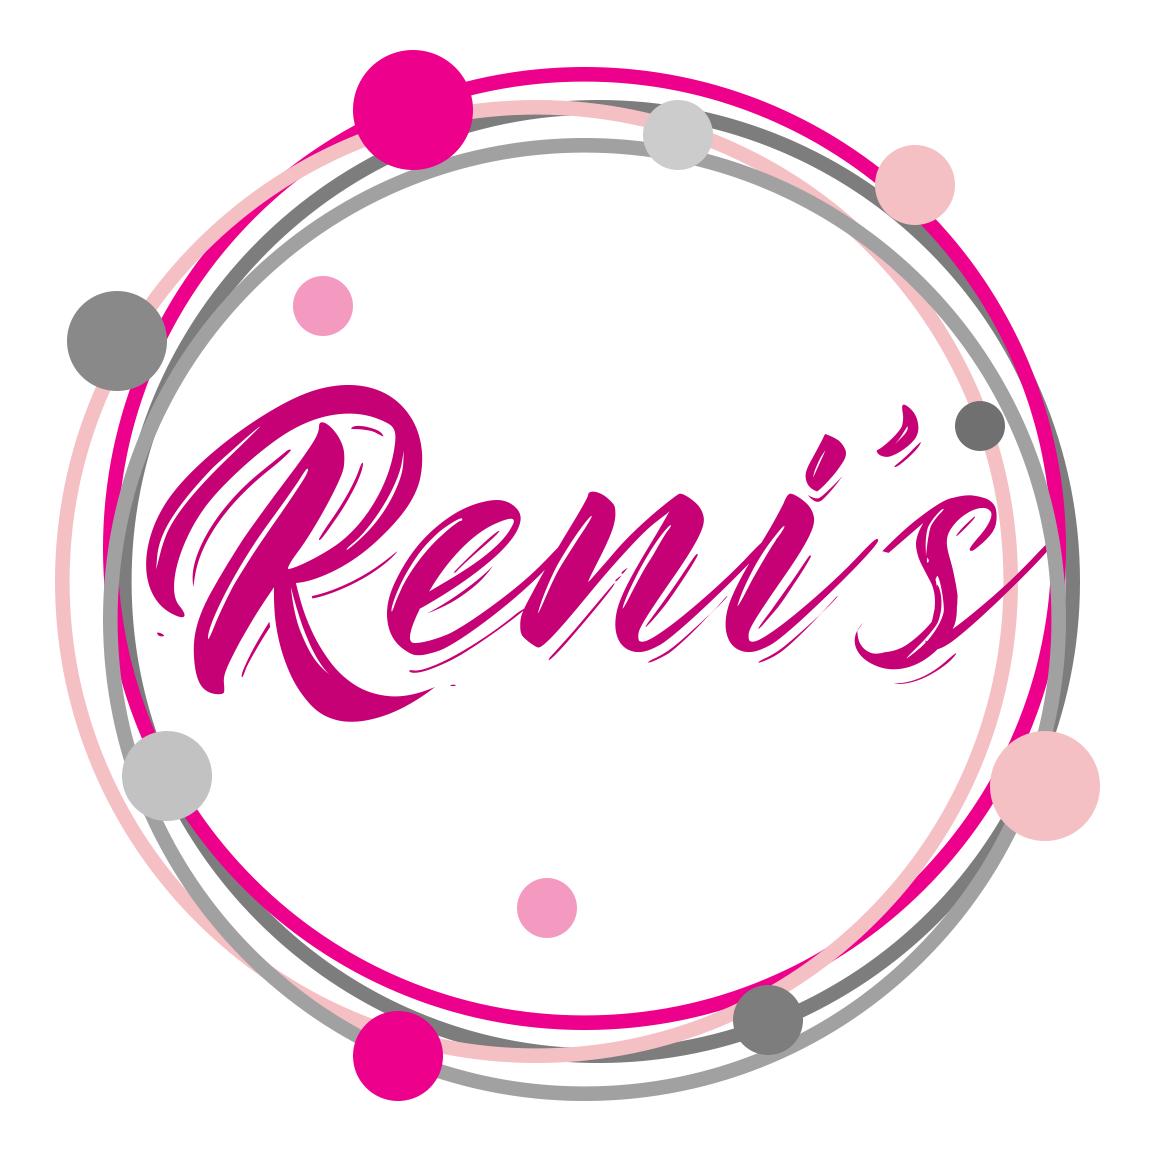 Reni's – A Karkötő Birodalom